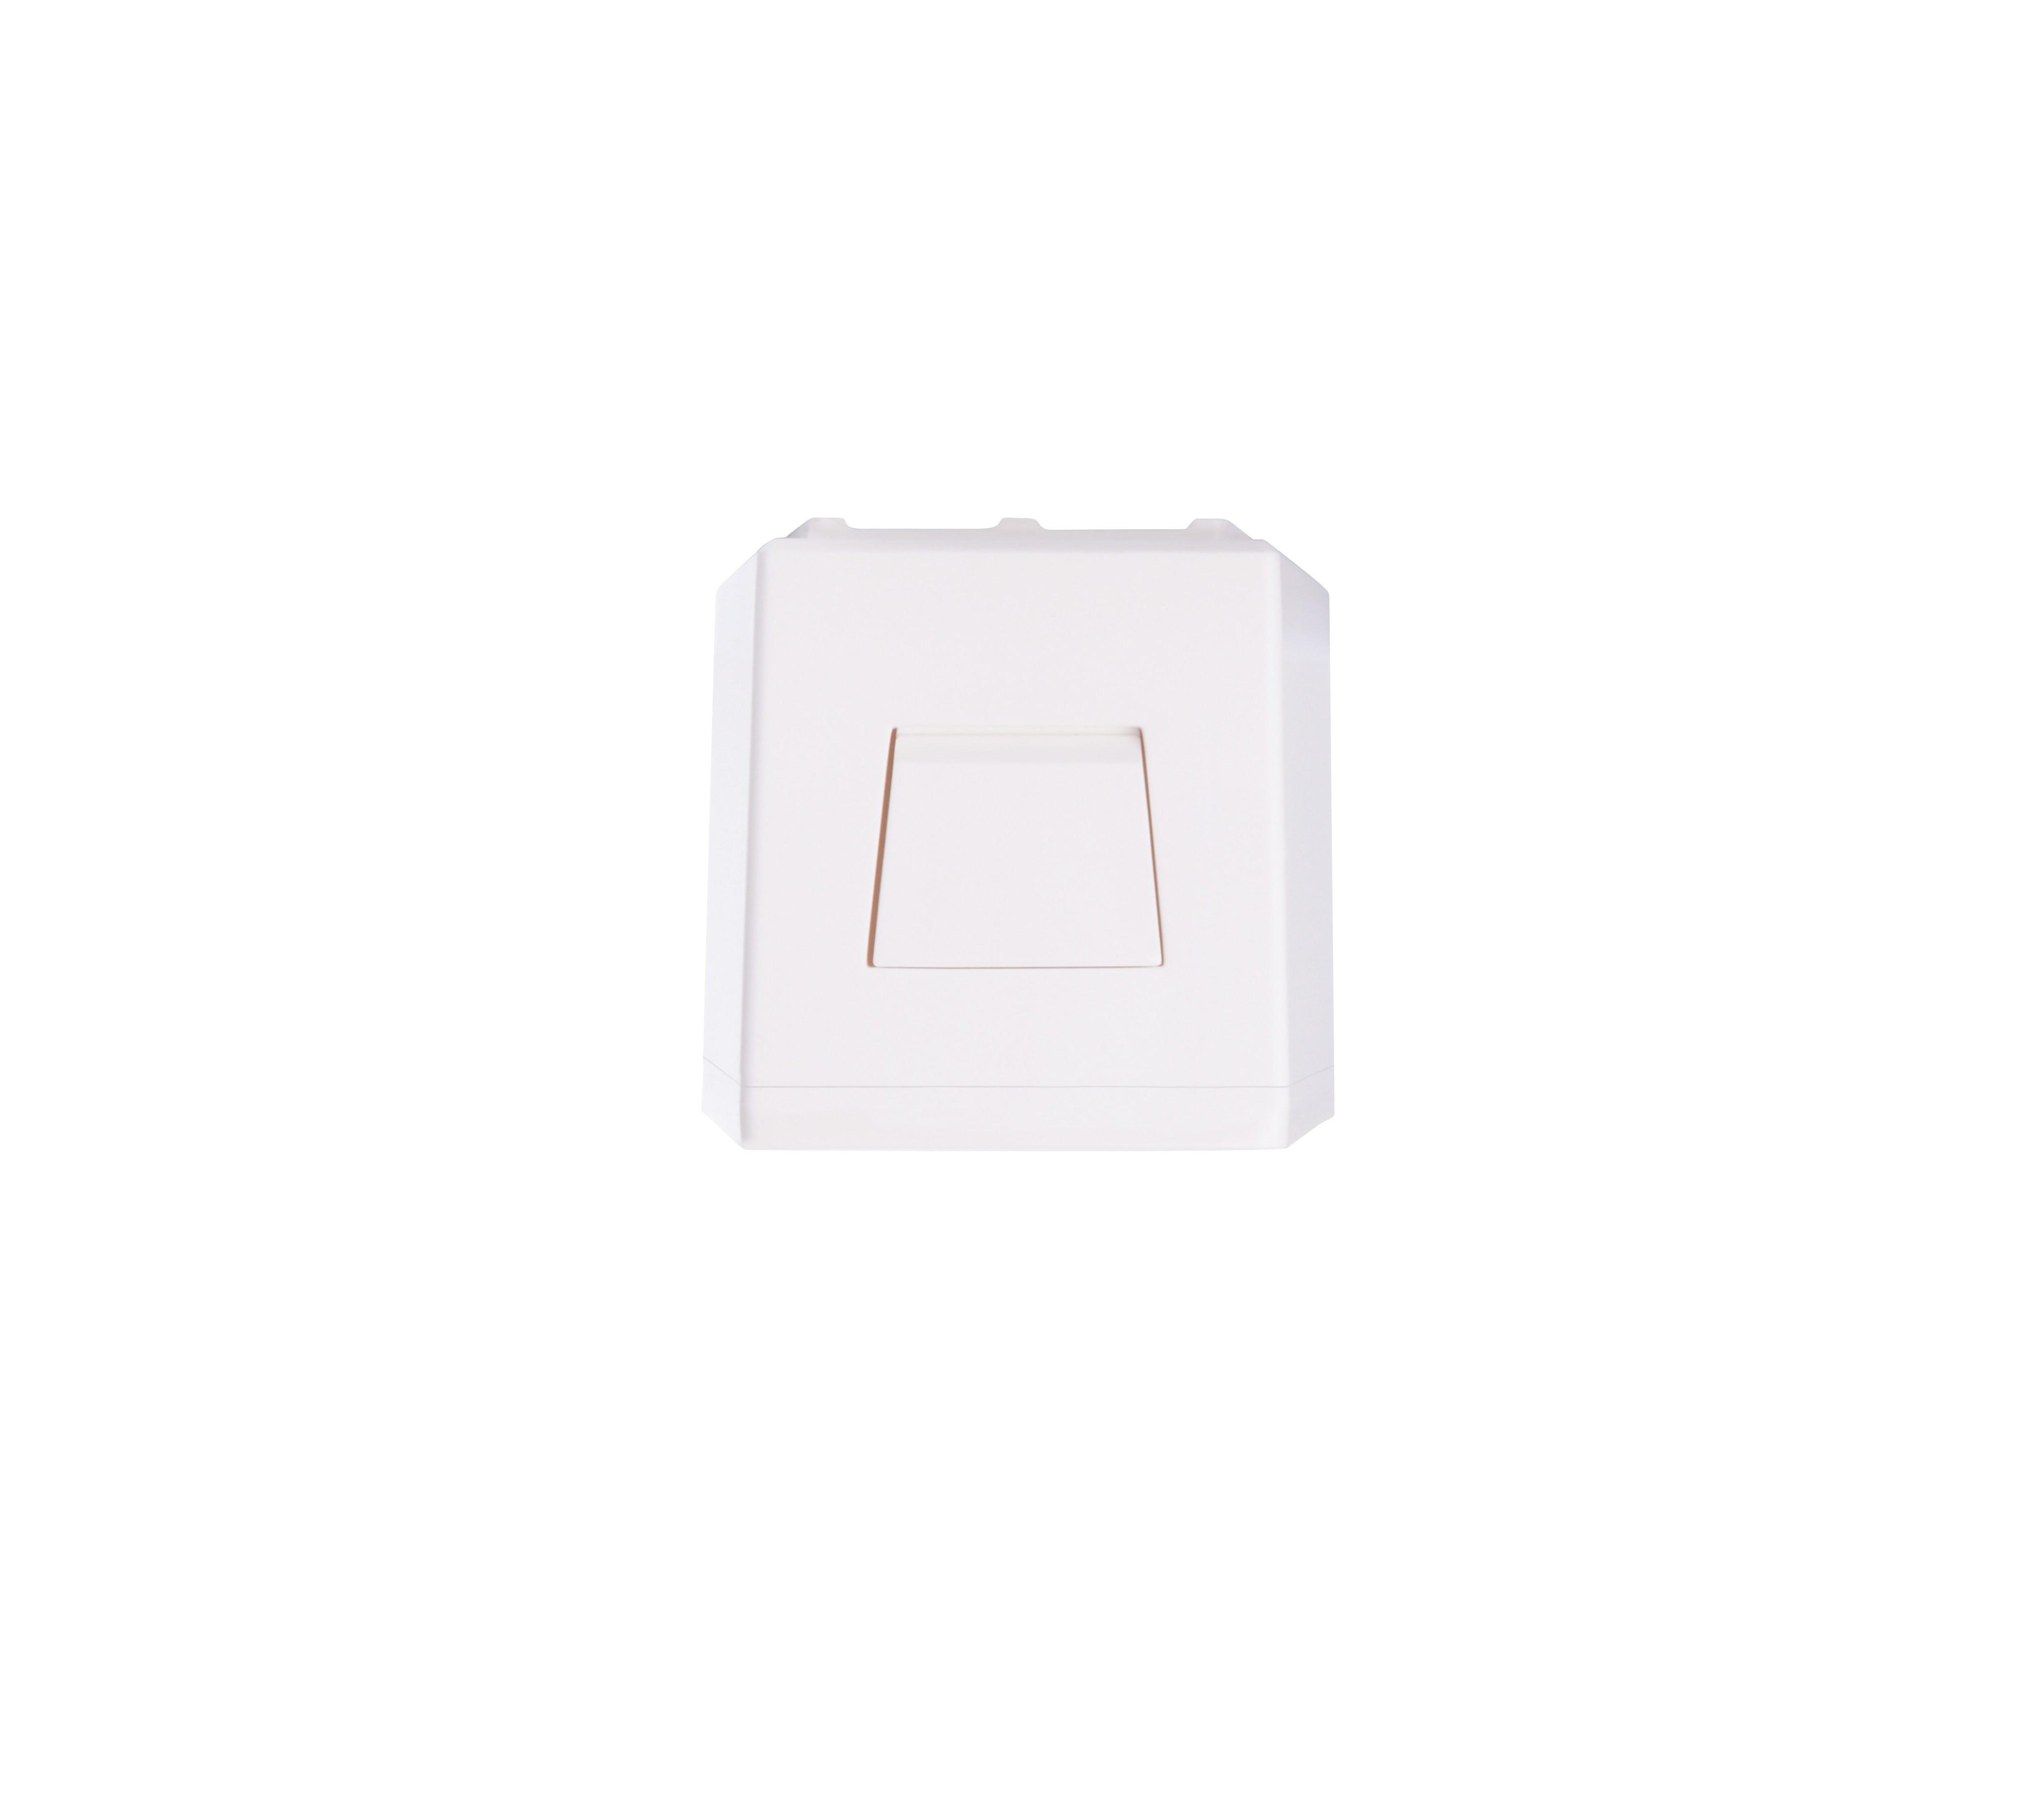 Lampa emergenta led Intelight 94562   3h mentinut test automat 1